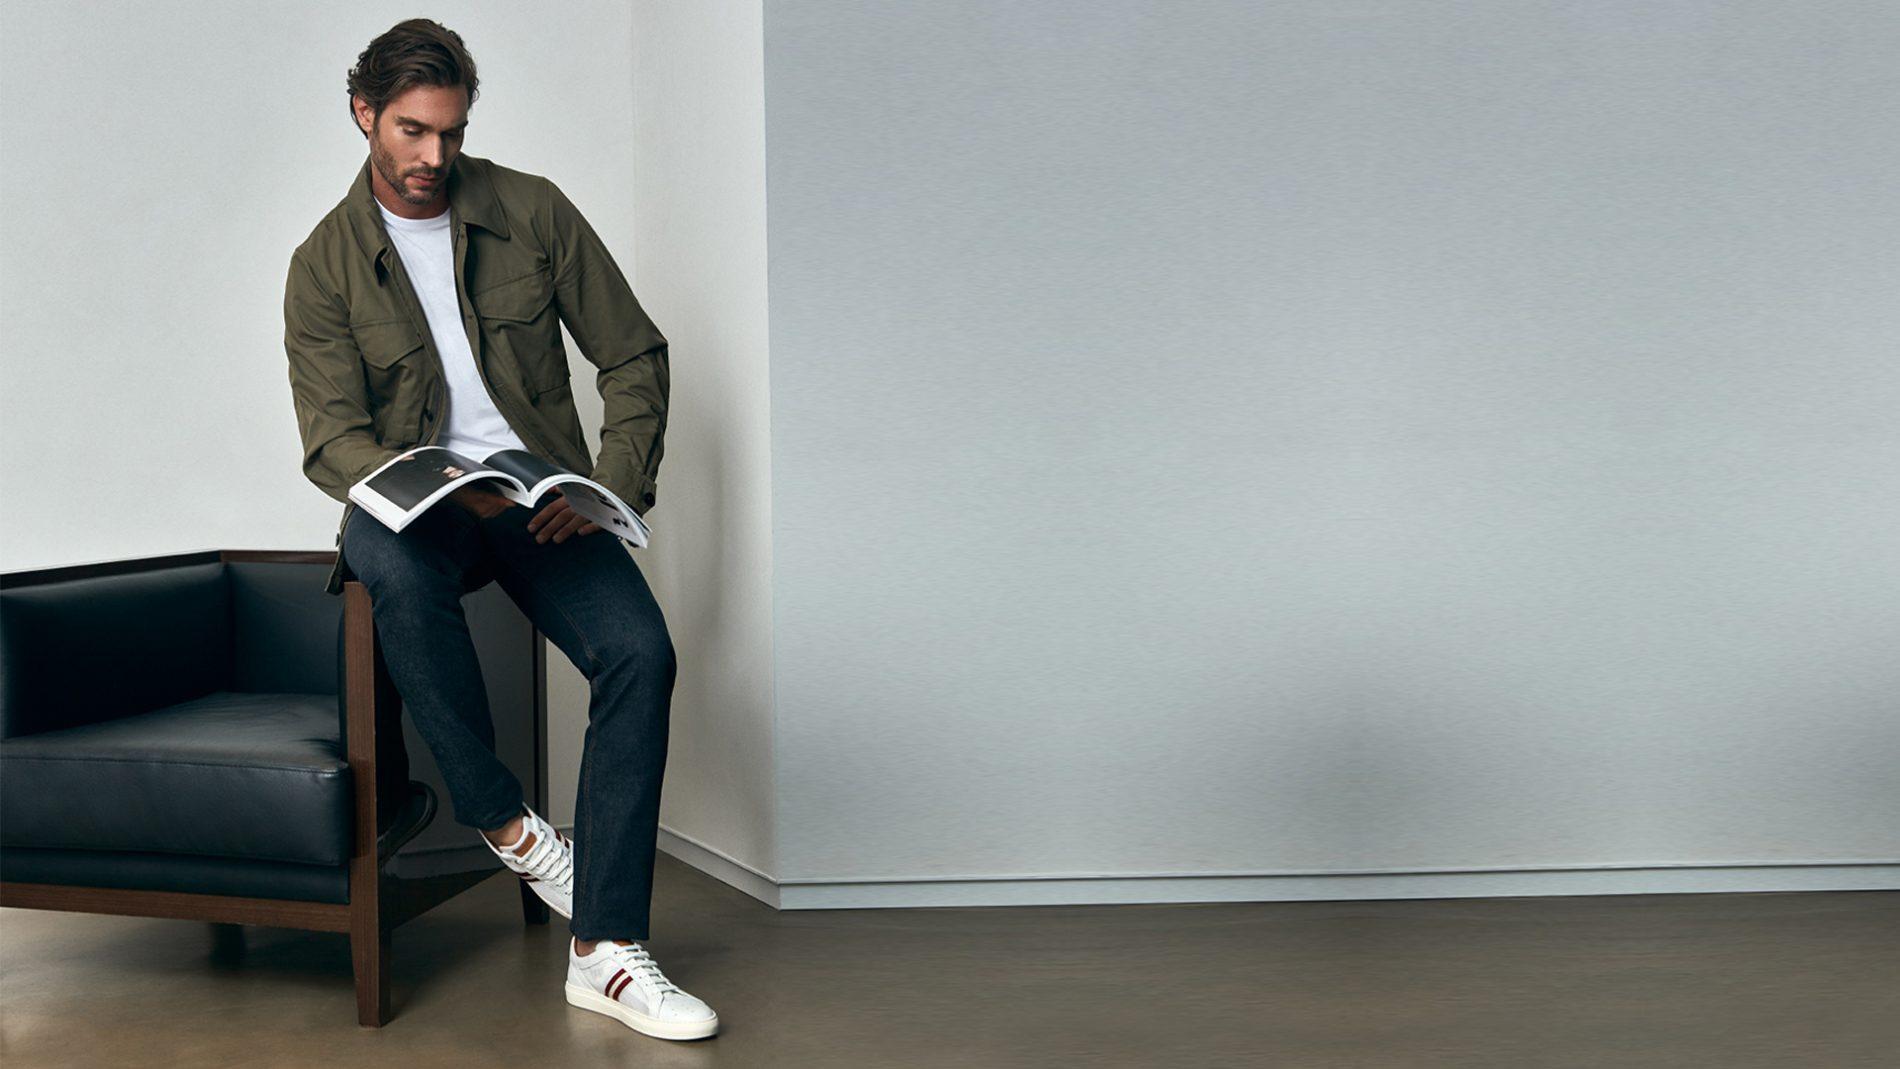 El Corte Inglés Designer Menswear Sneakers Tom Ford Alexander McQueen Berluti Bally